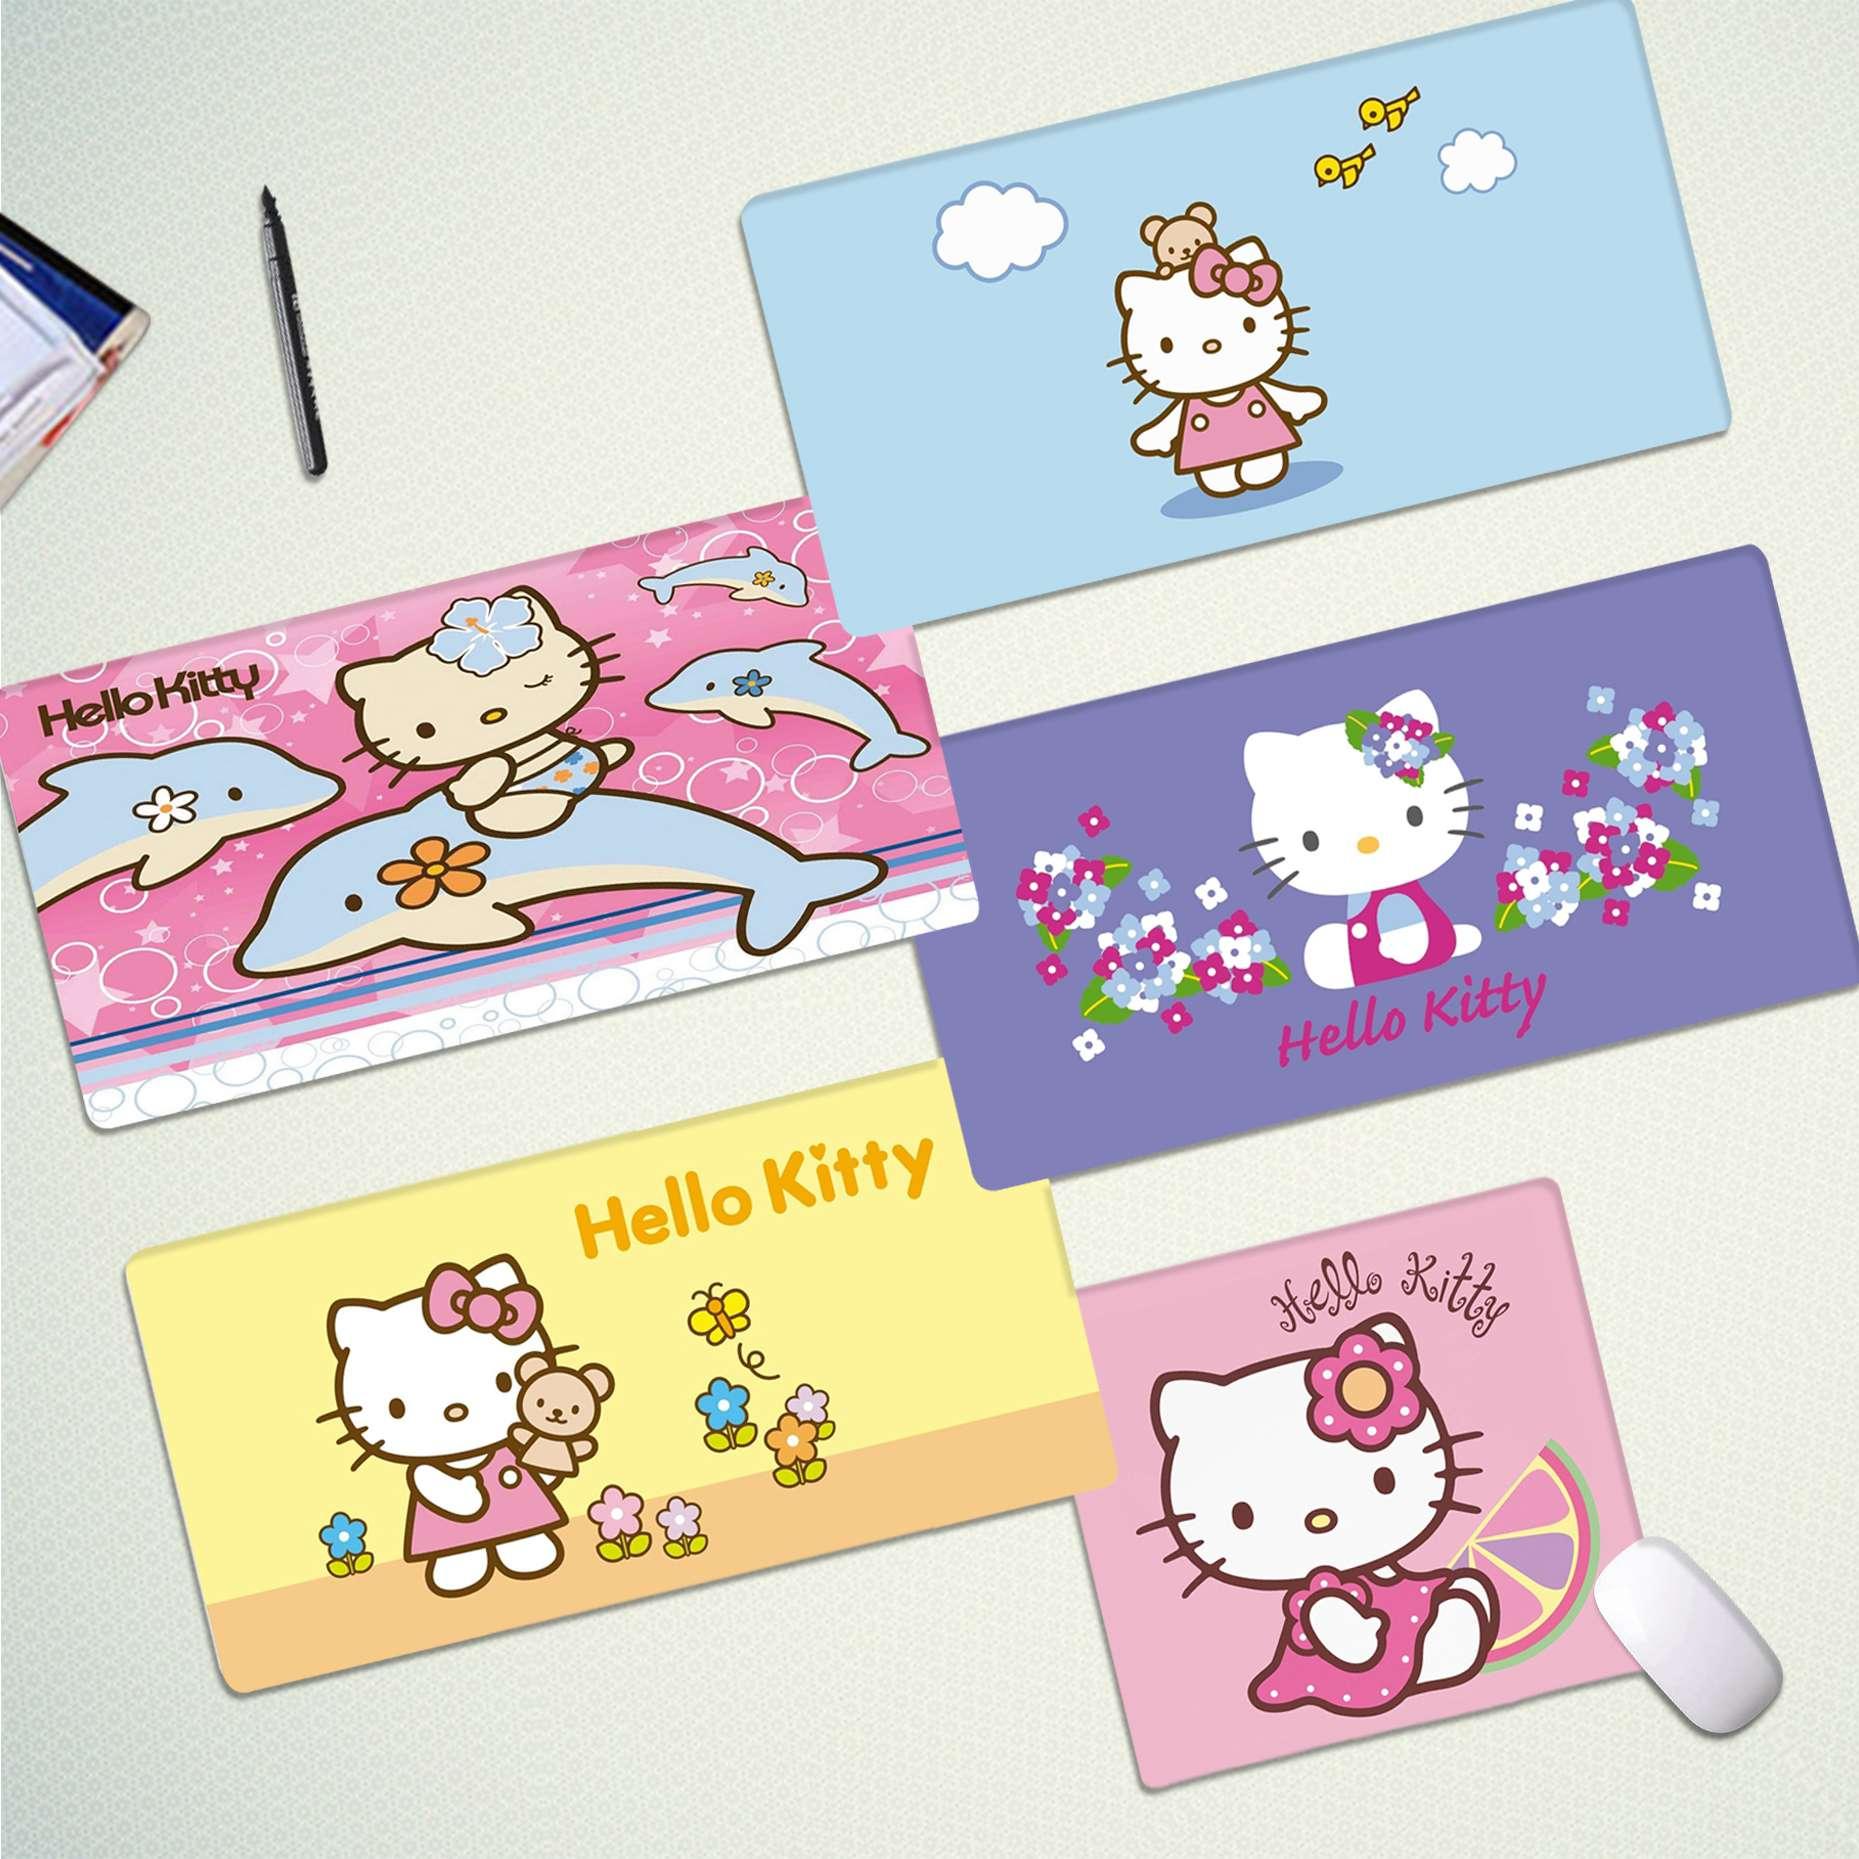 Maiya Boy Gift Pad Pink Hello Kitty Cat Laptop Computer Mousepad Free Shipping Large Mouse Pad Keyboards Mat